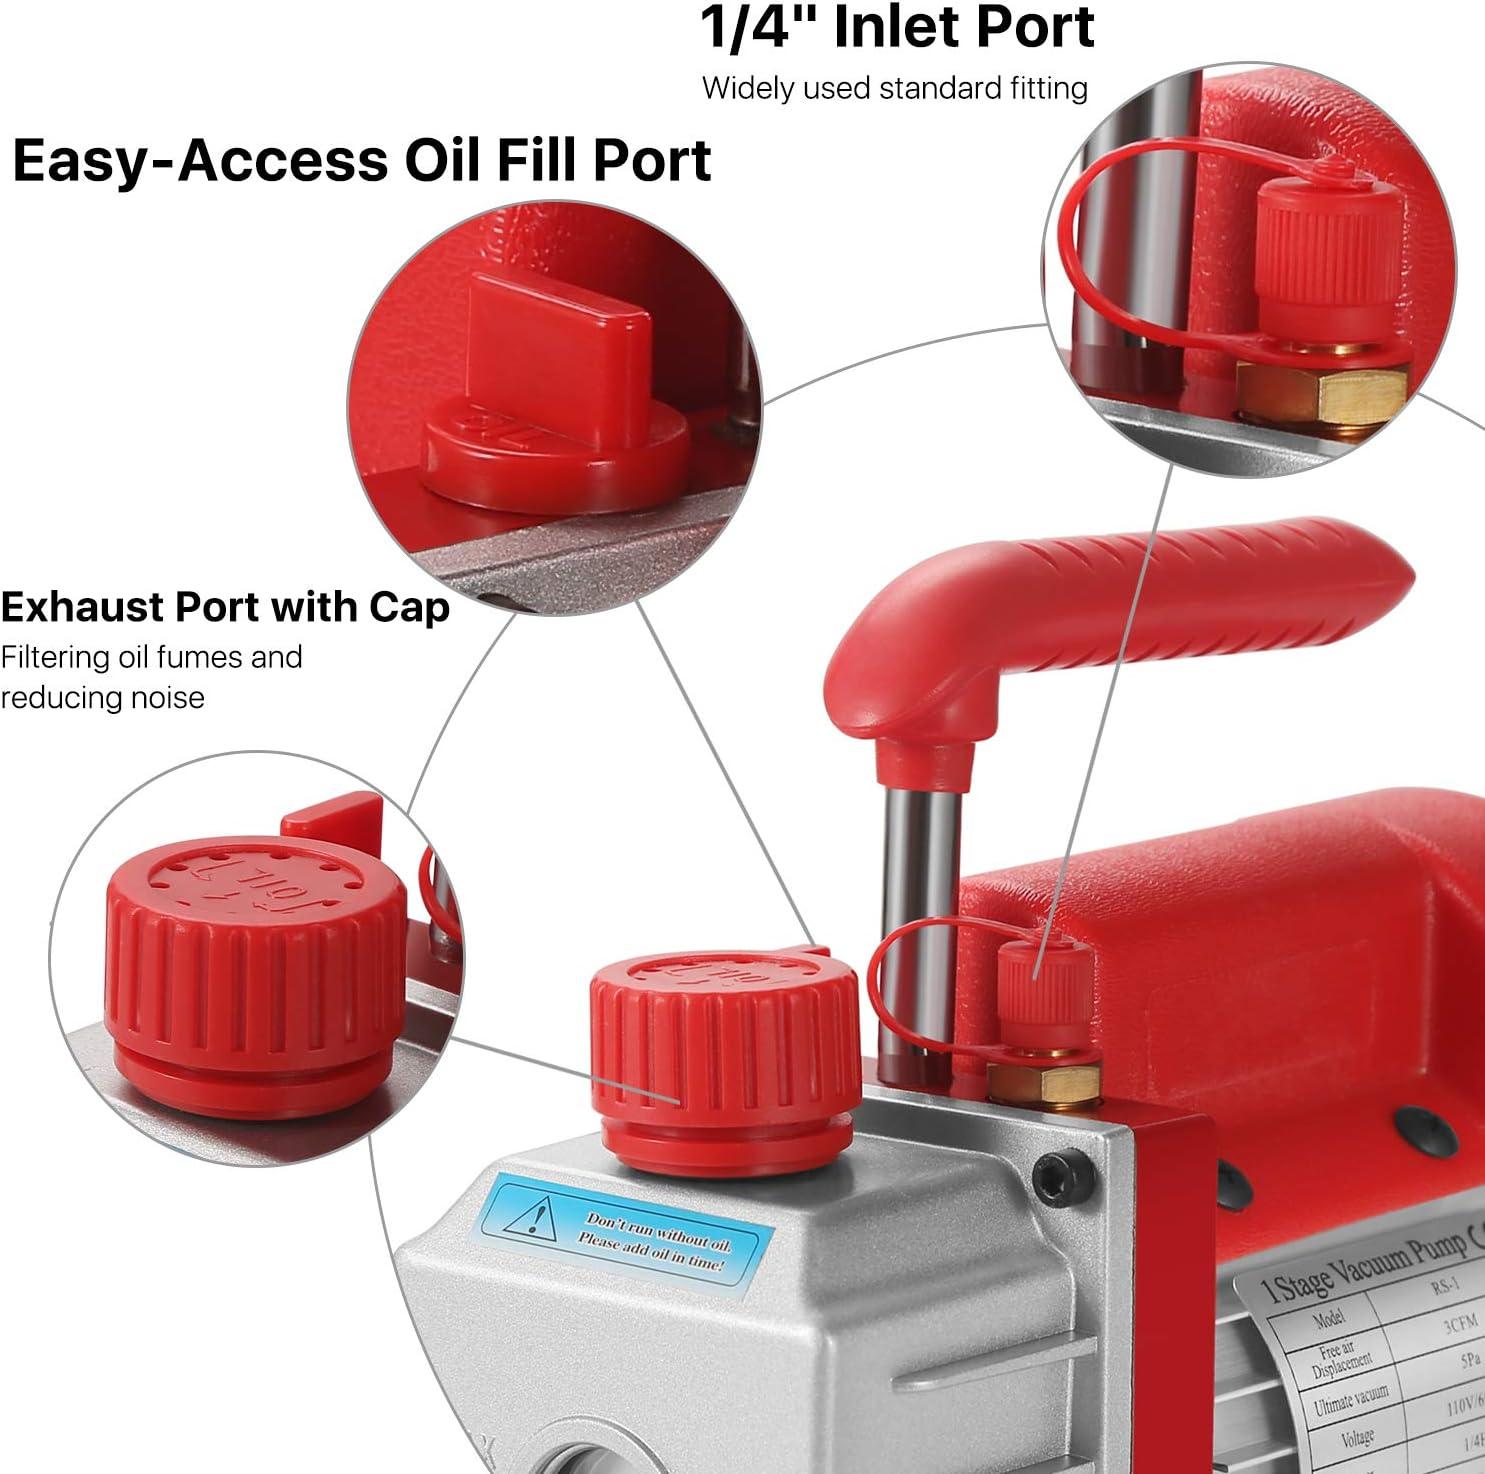 Oil Hose Storage Case HVAC Manifold Gauge Set Flexzion Car Automotive AC Refrigerant Air Conditioning Repair Recharge 1//4 SAE Tool Kit with Electric Vacuum Pump Coupler R134a Can Tap